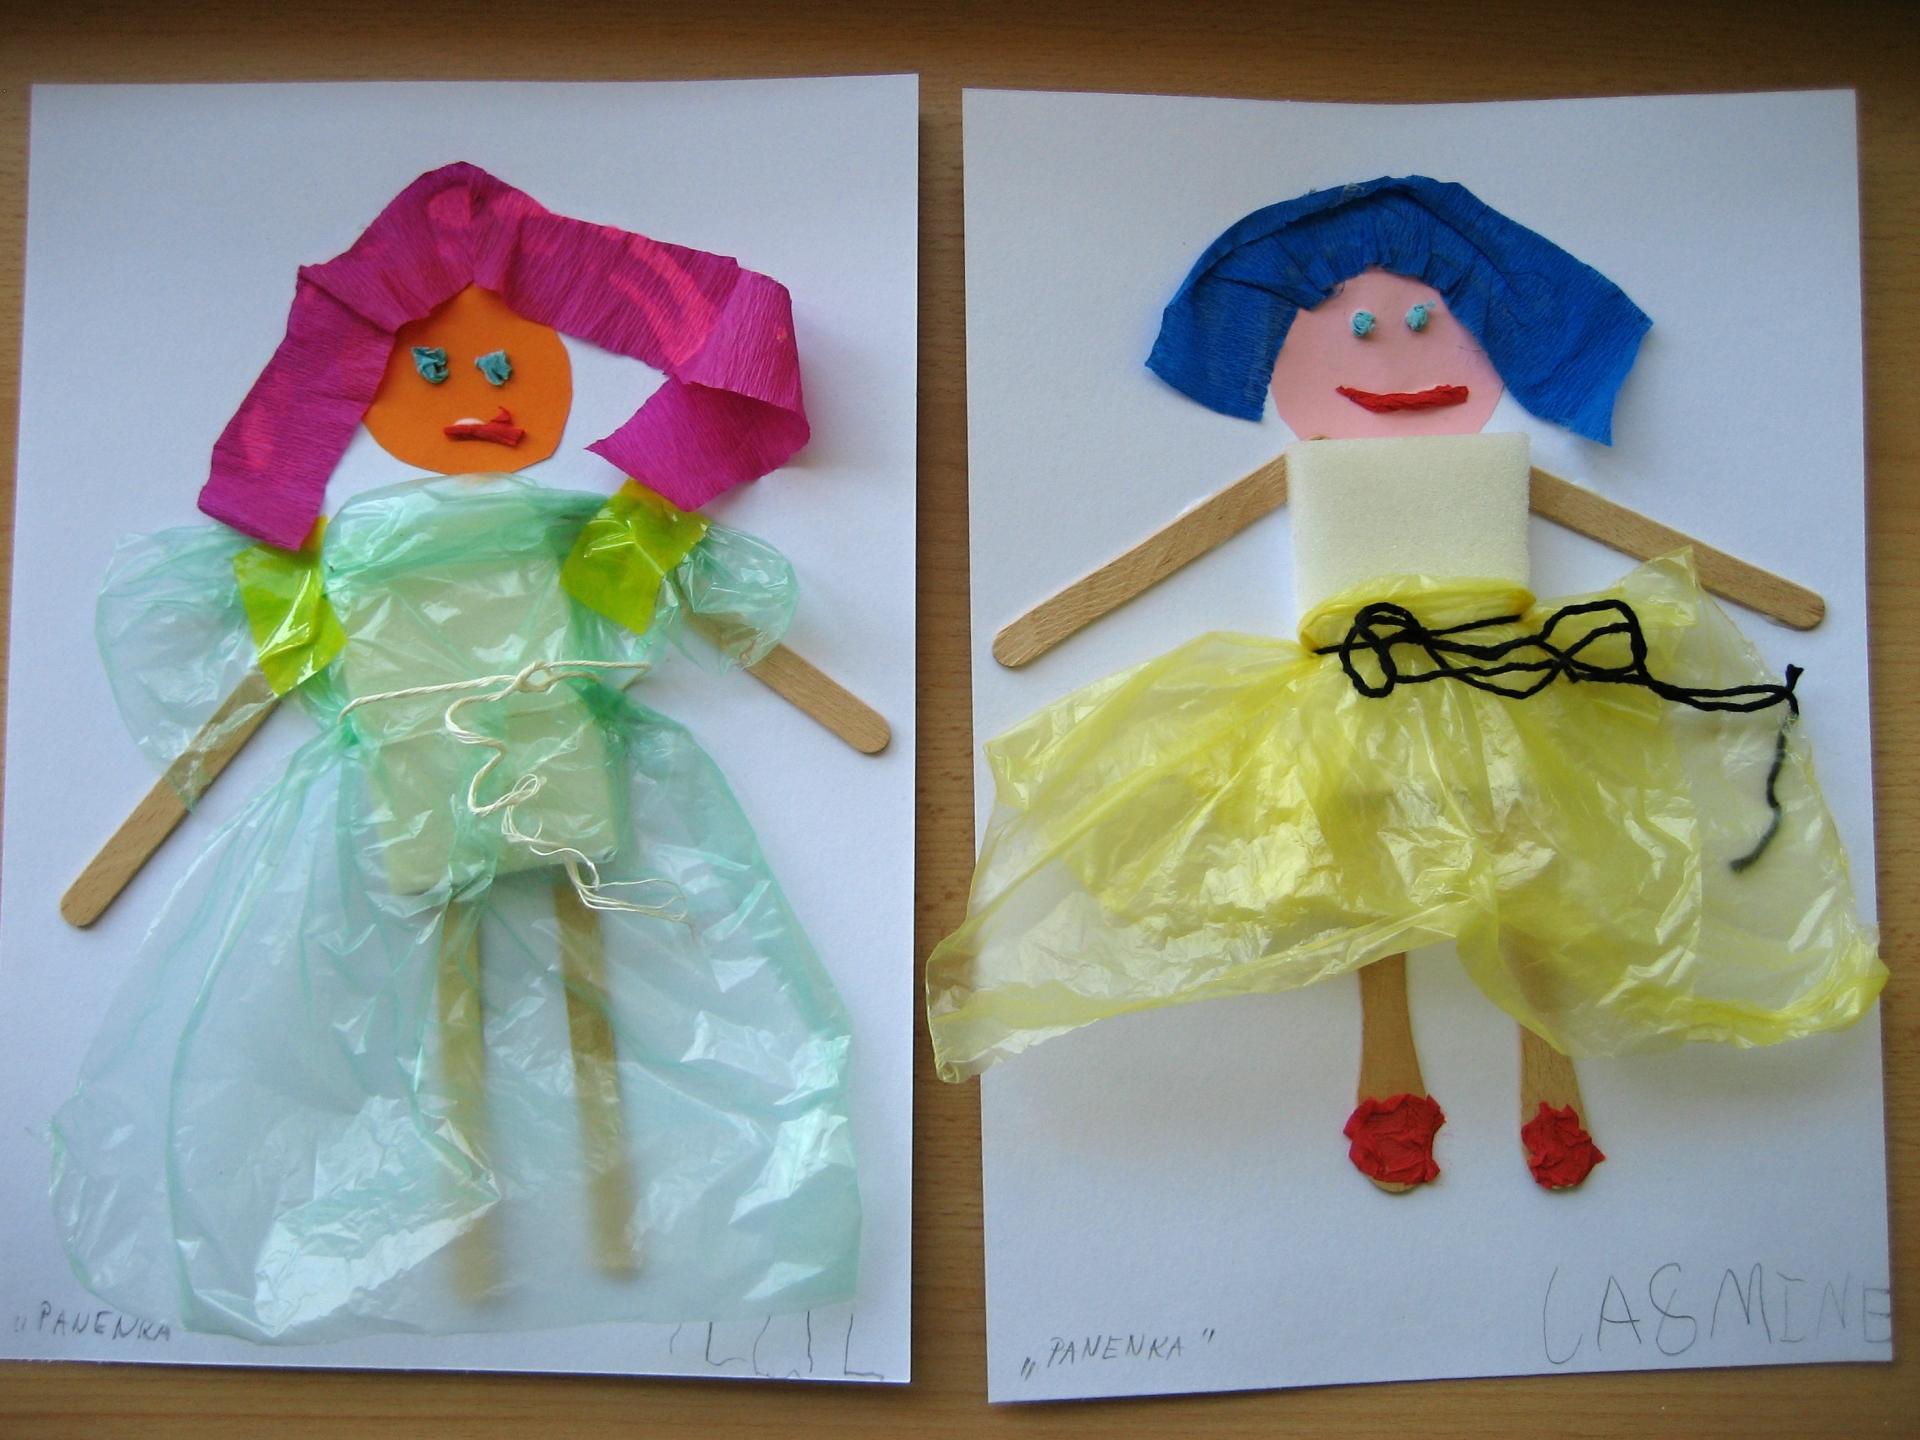 Obrázky panenek - recyklace